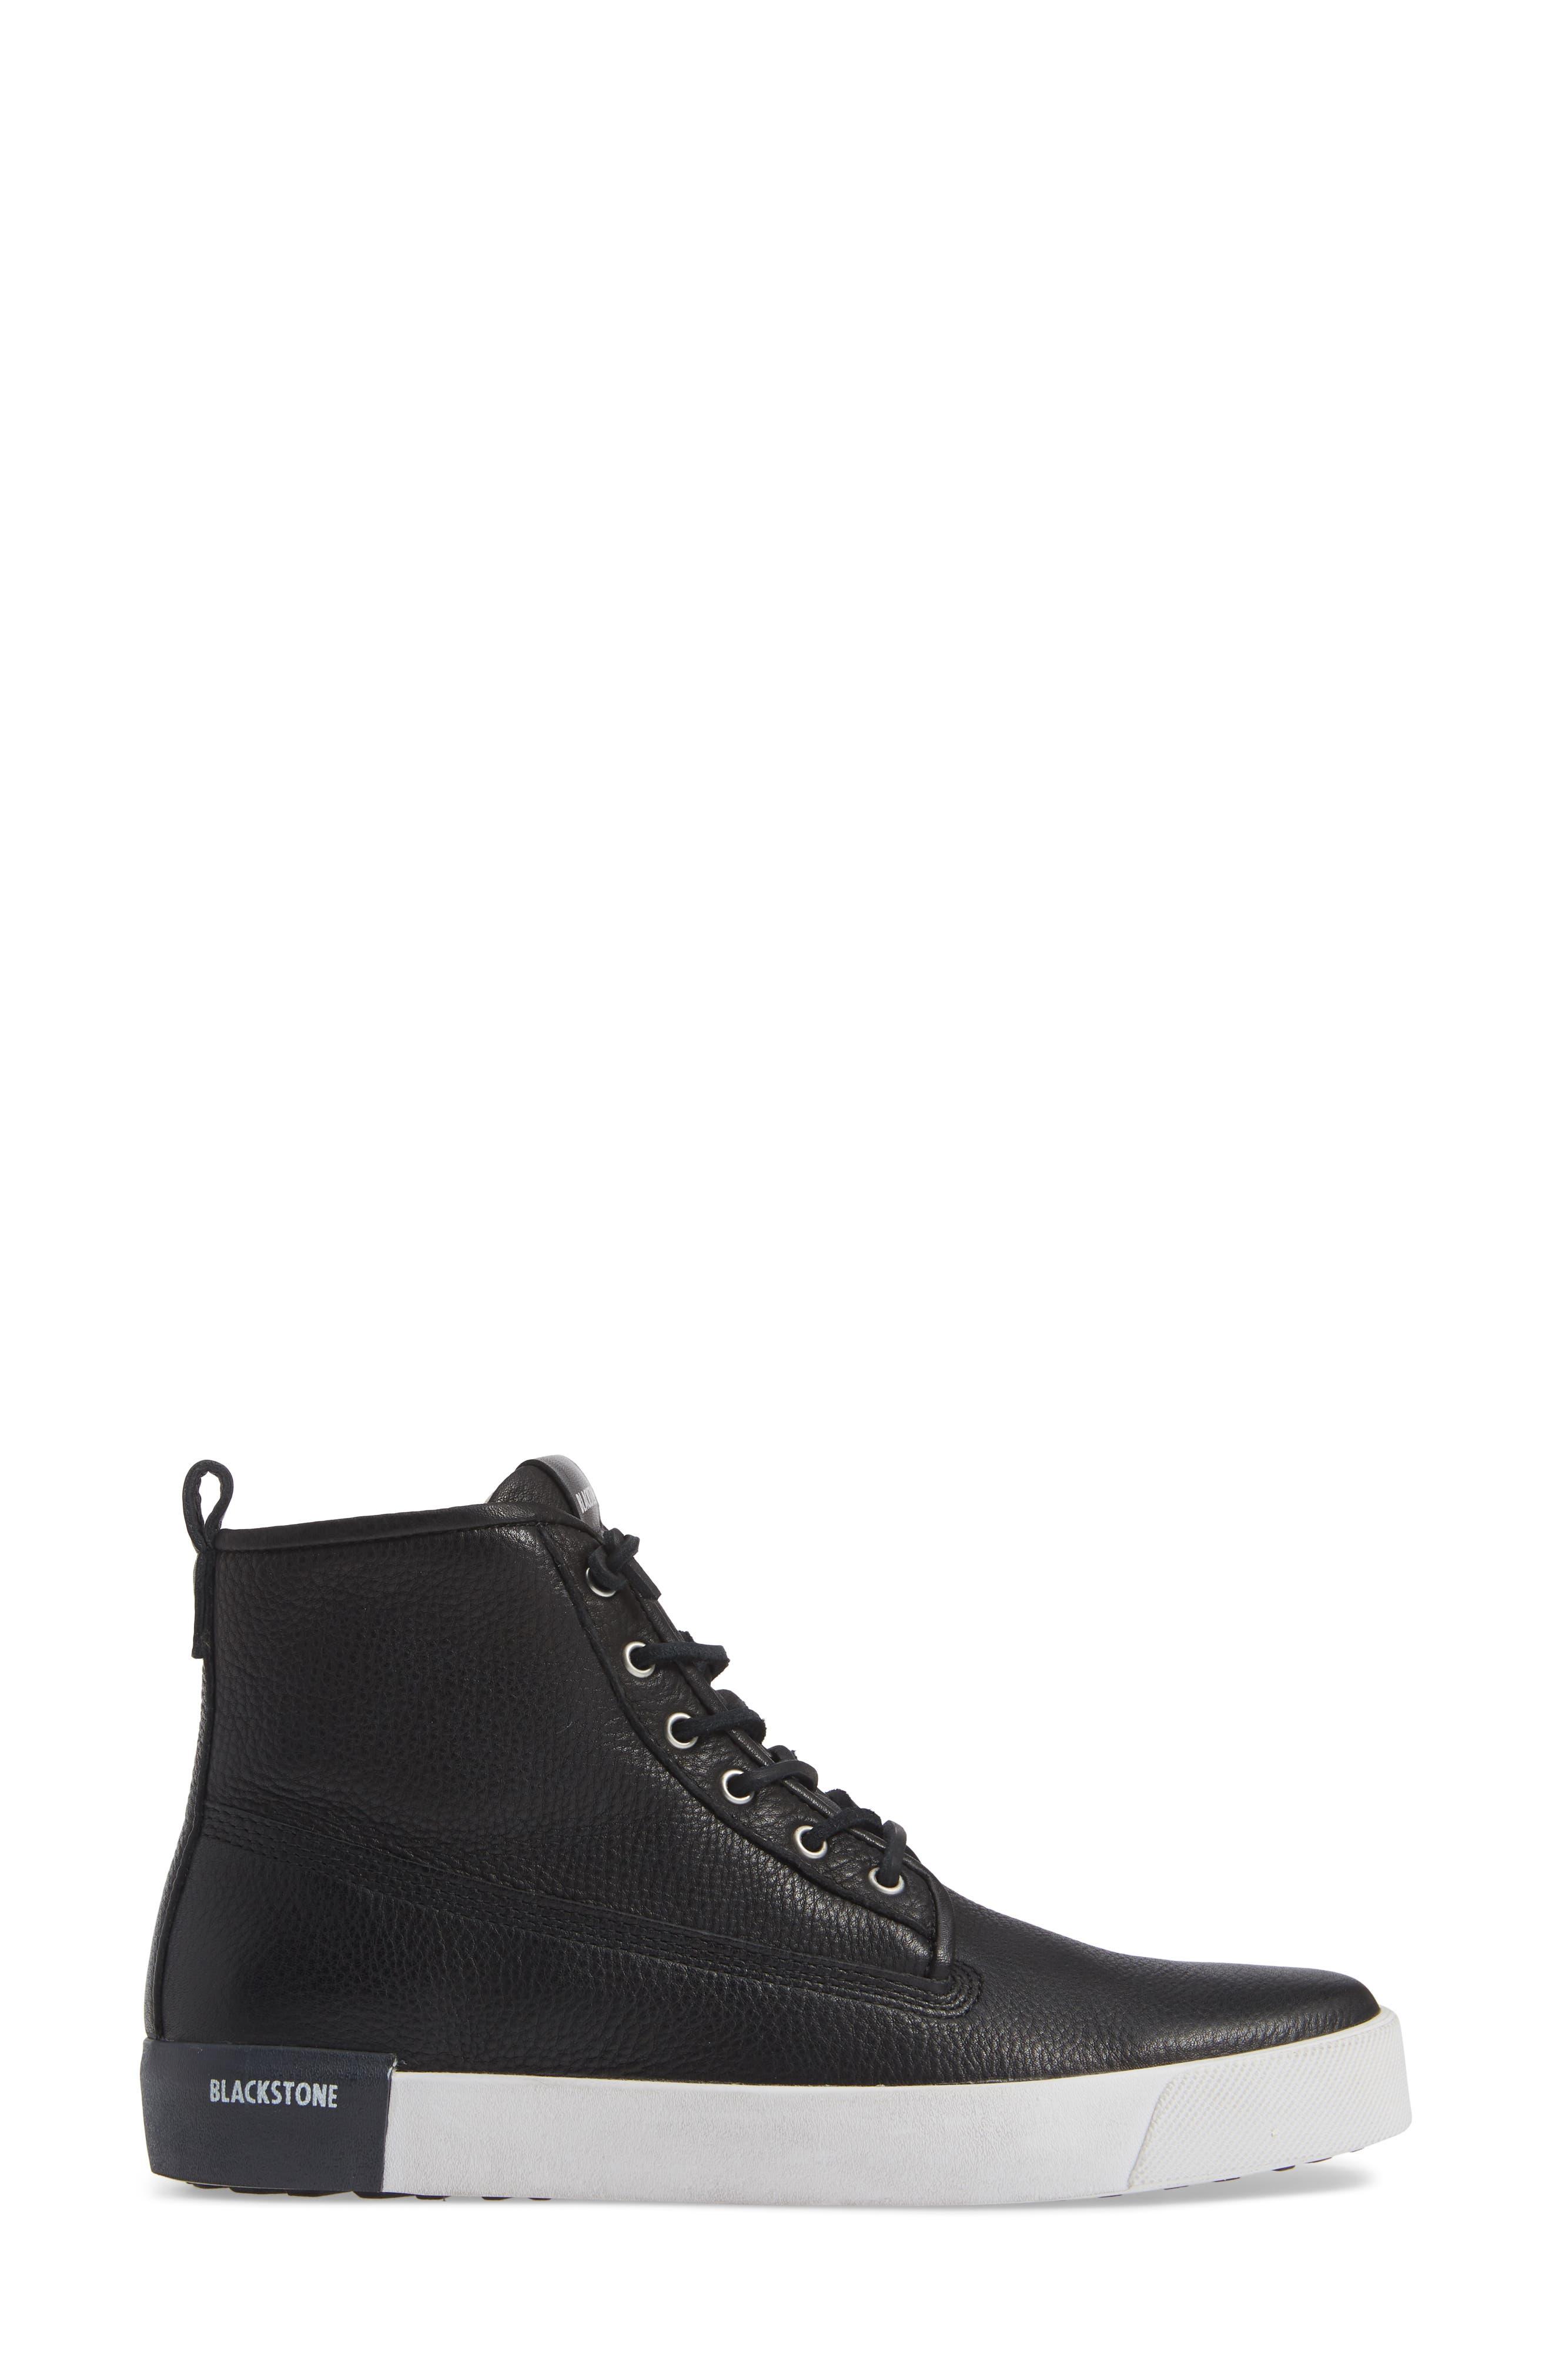 QM80 High Top Sneaker,                             Alternate thumbnail 3, color,                             BLACK